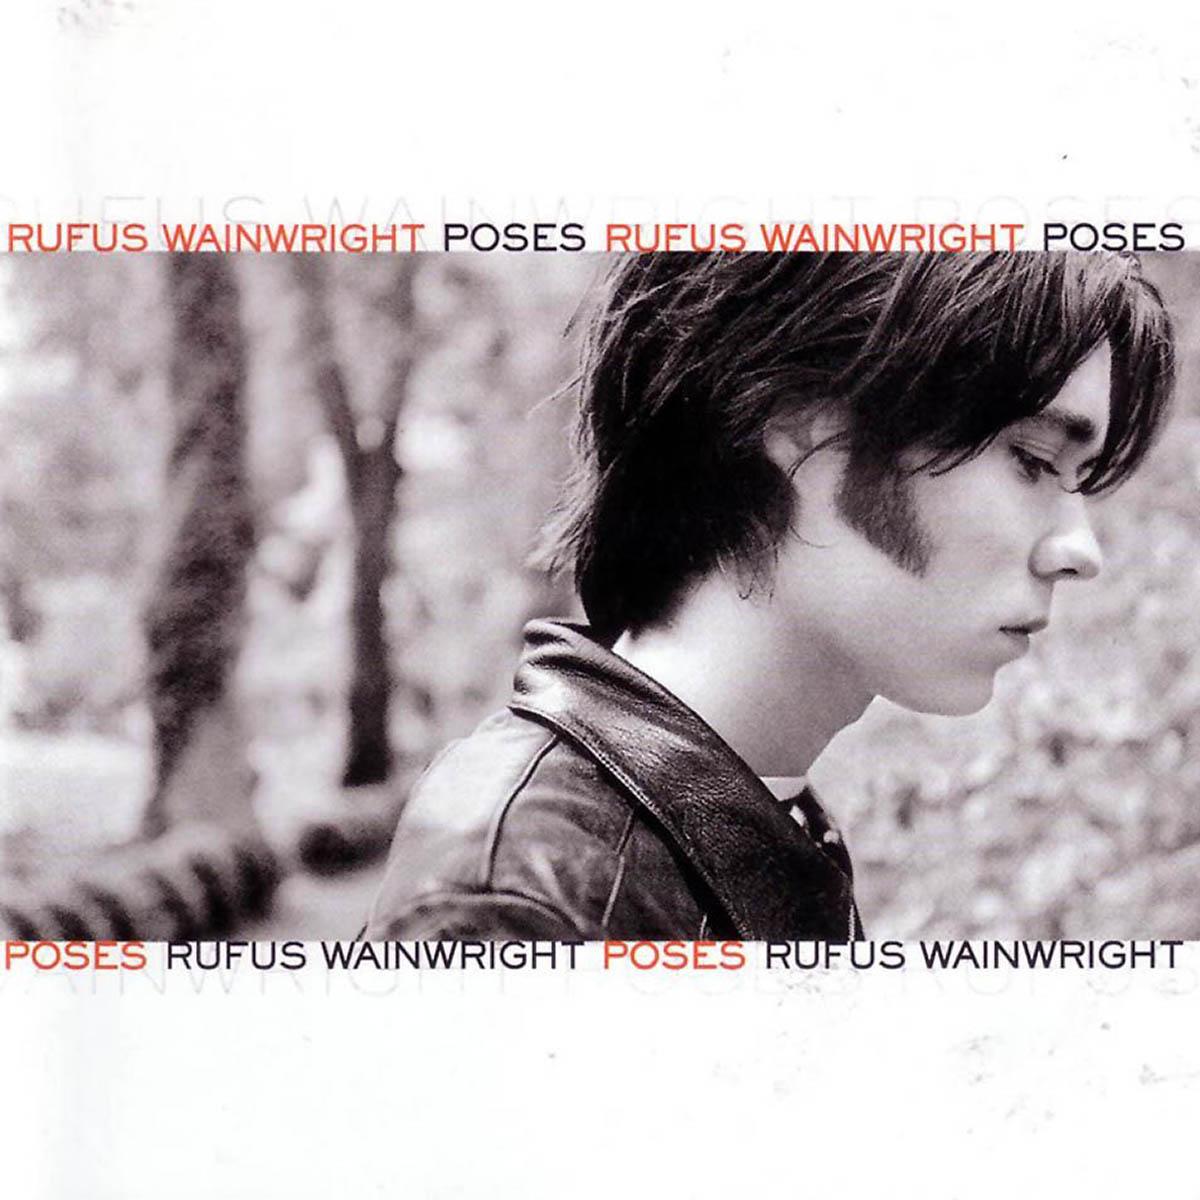 Rufus Wainwright, Poses